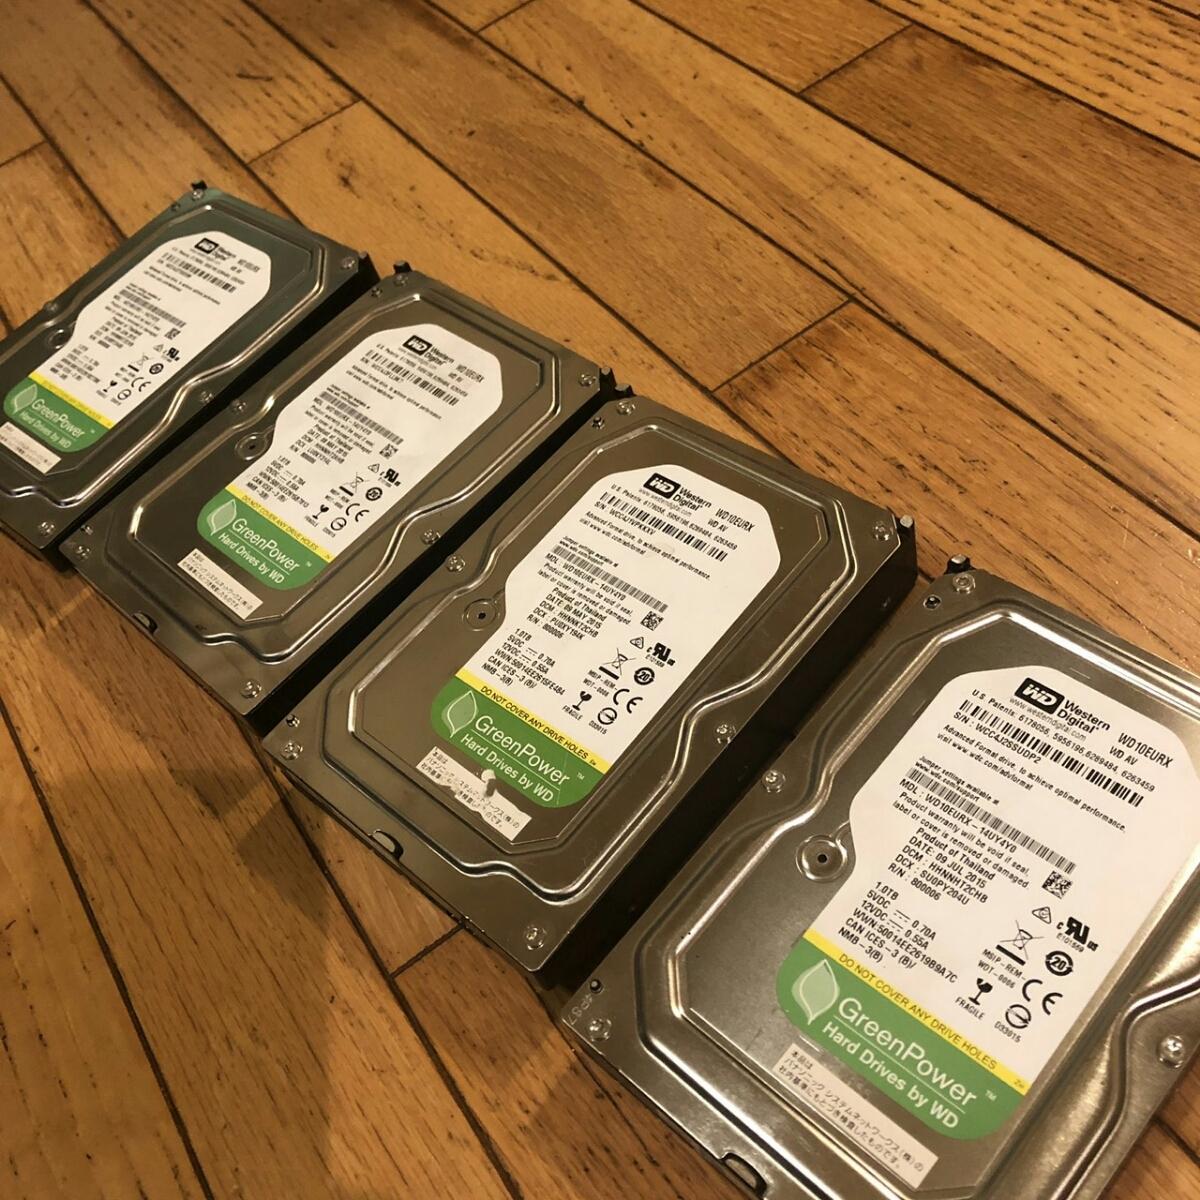 secondhand goods /WD/Western Digital/ hard disk drive